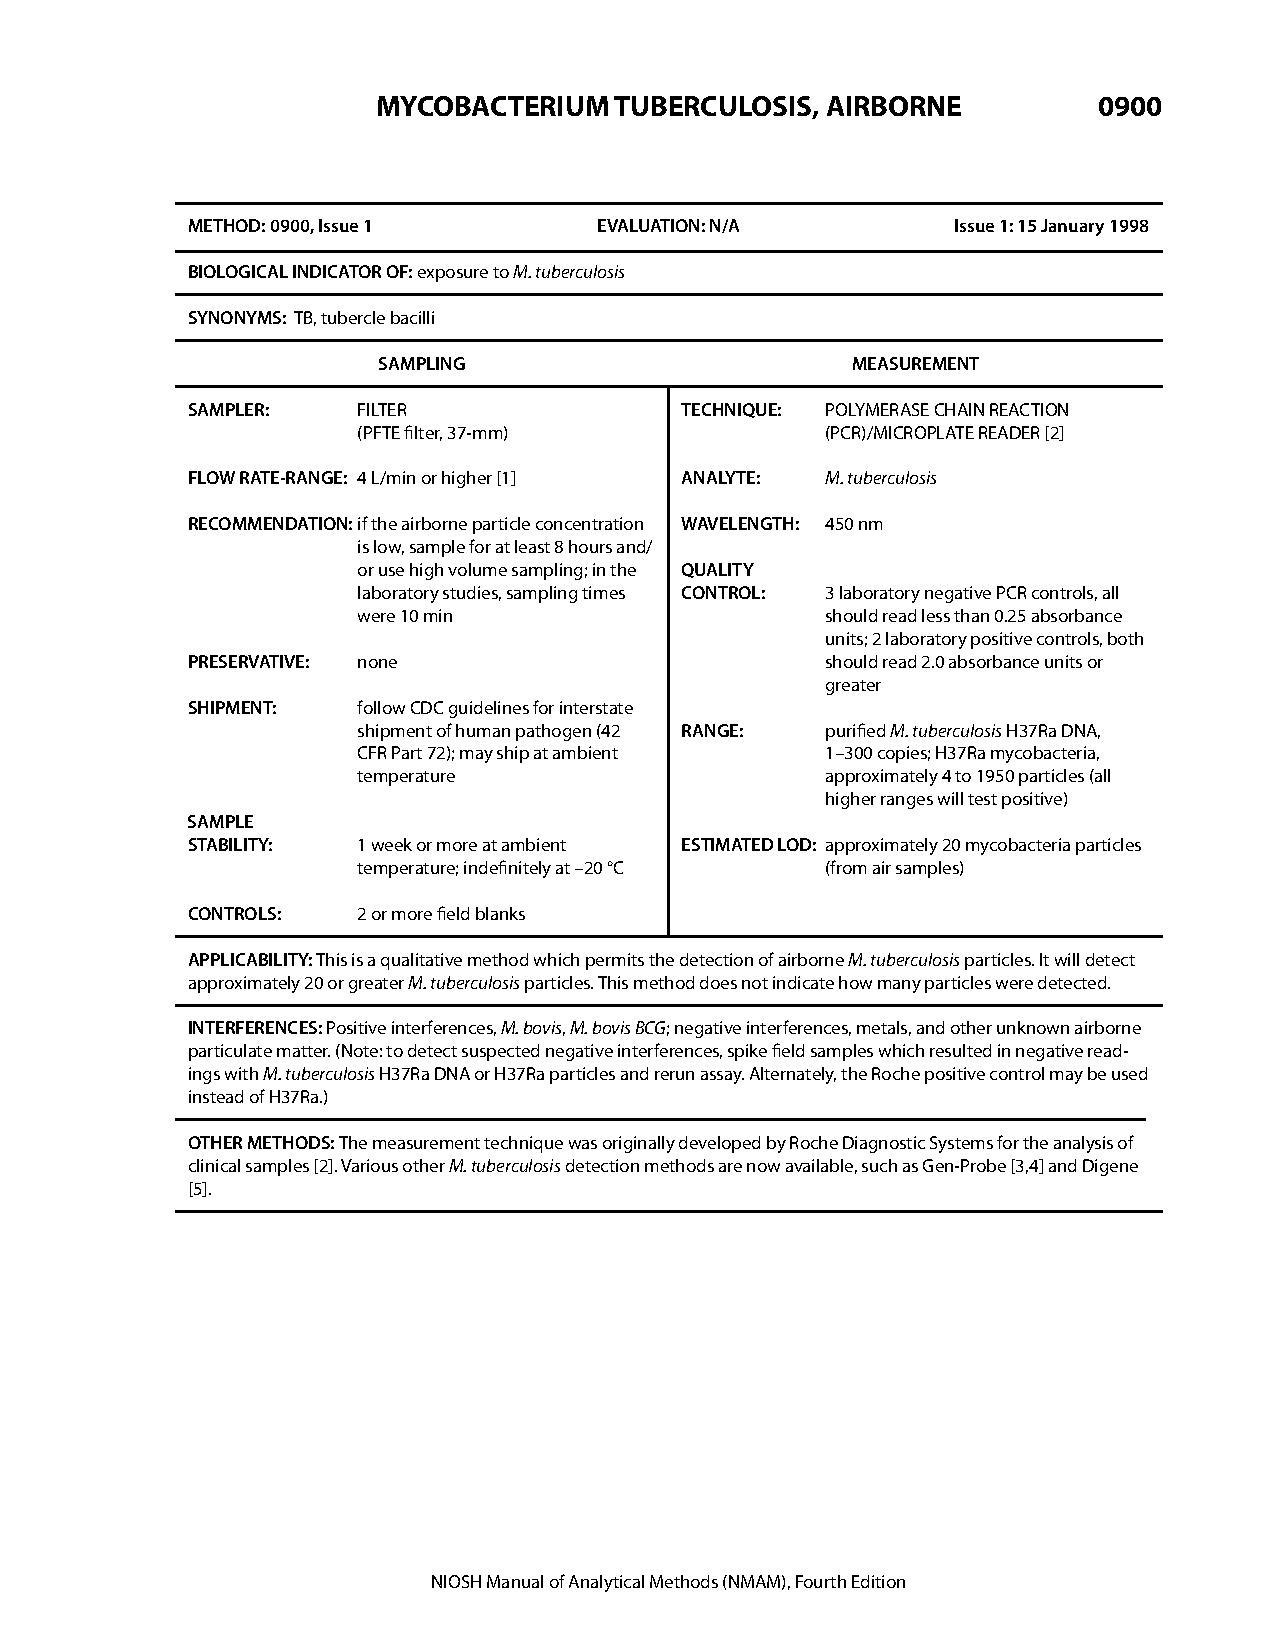 File:NIOSH Manual of Analytical Methods - 0900.pdf - Wikimedia Commons